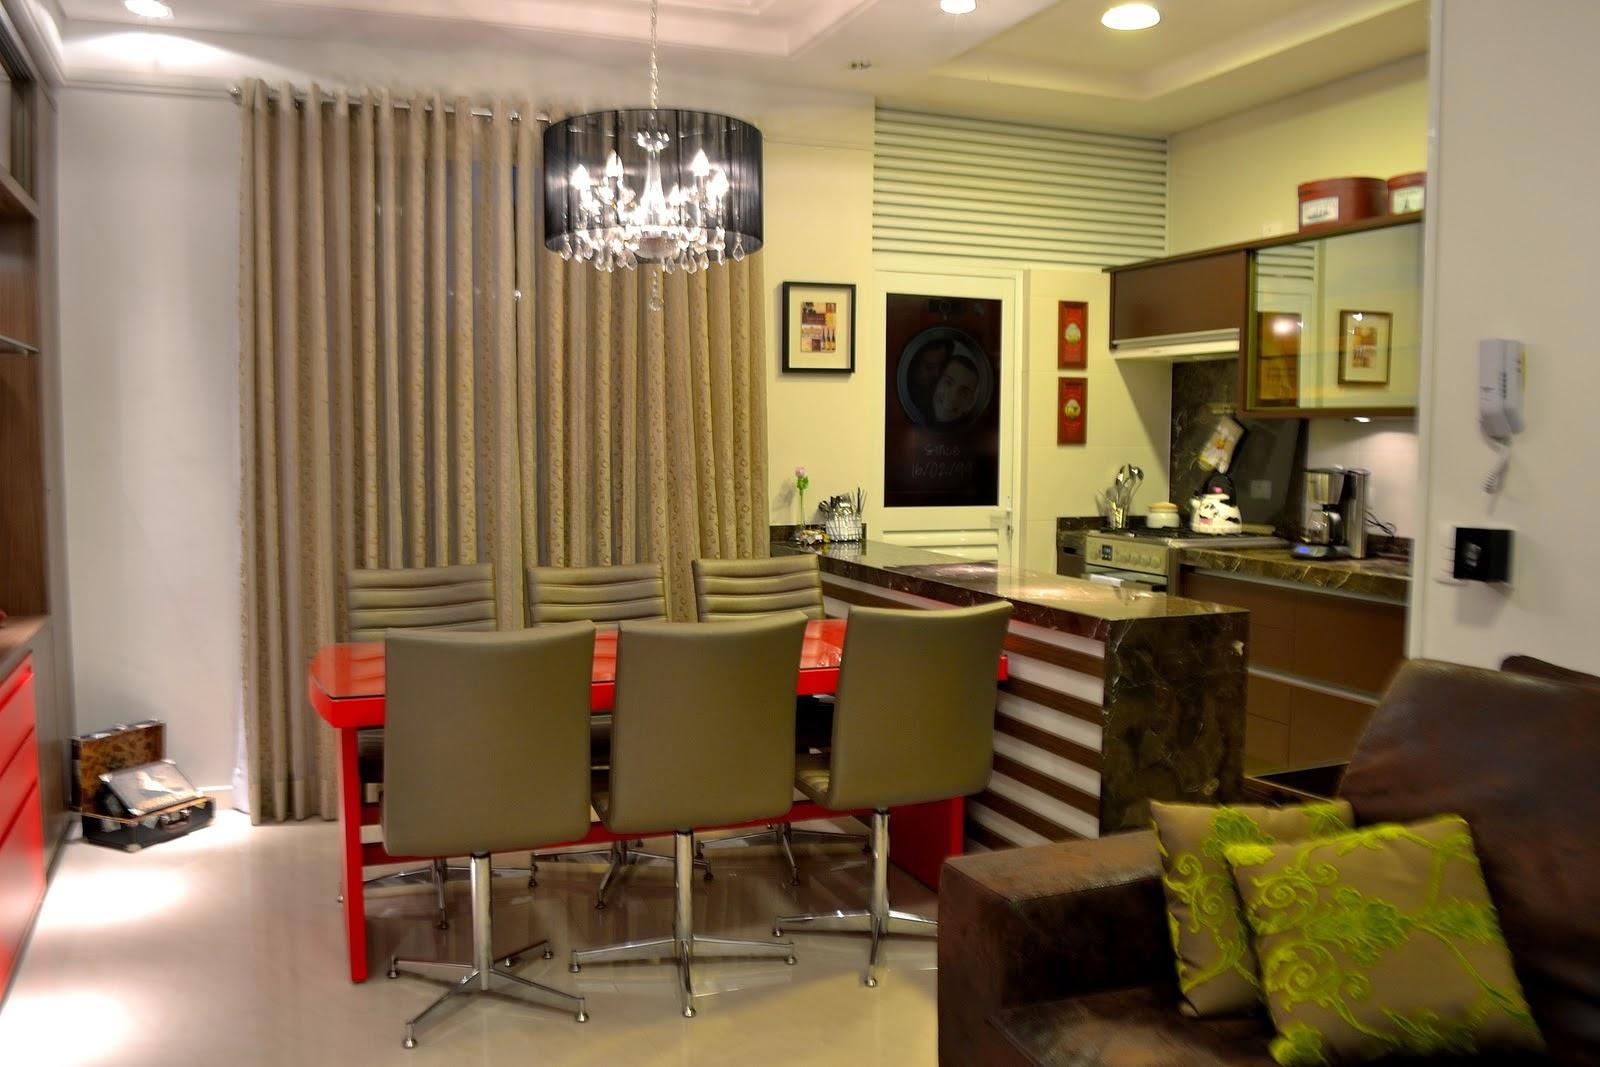 Construindo Minha Casa Clean Salas De Jantar Pequenas Com Mesas  -> Sala De Jantar Pequena Com Mesa De Marmore